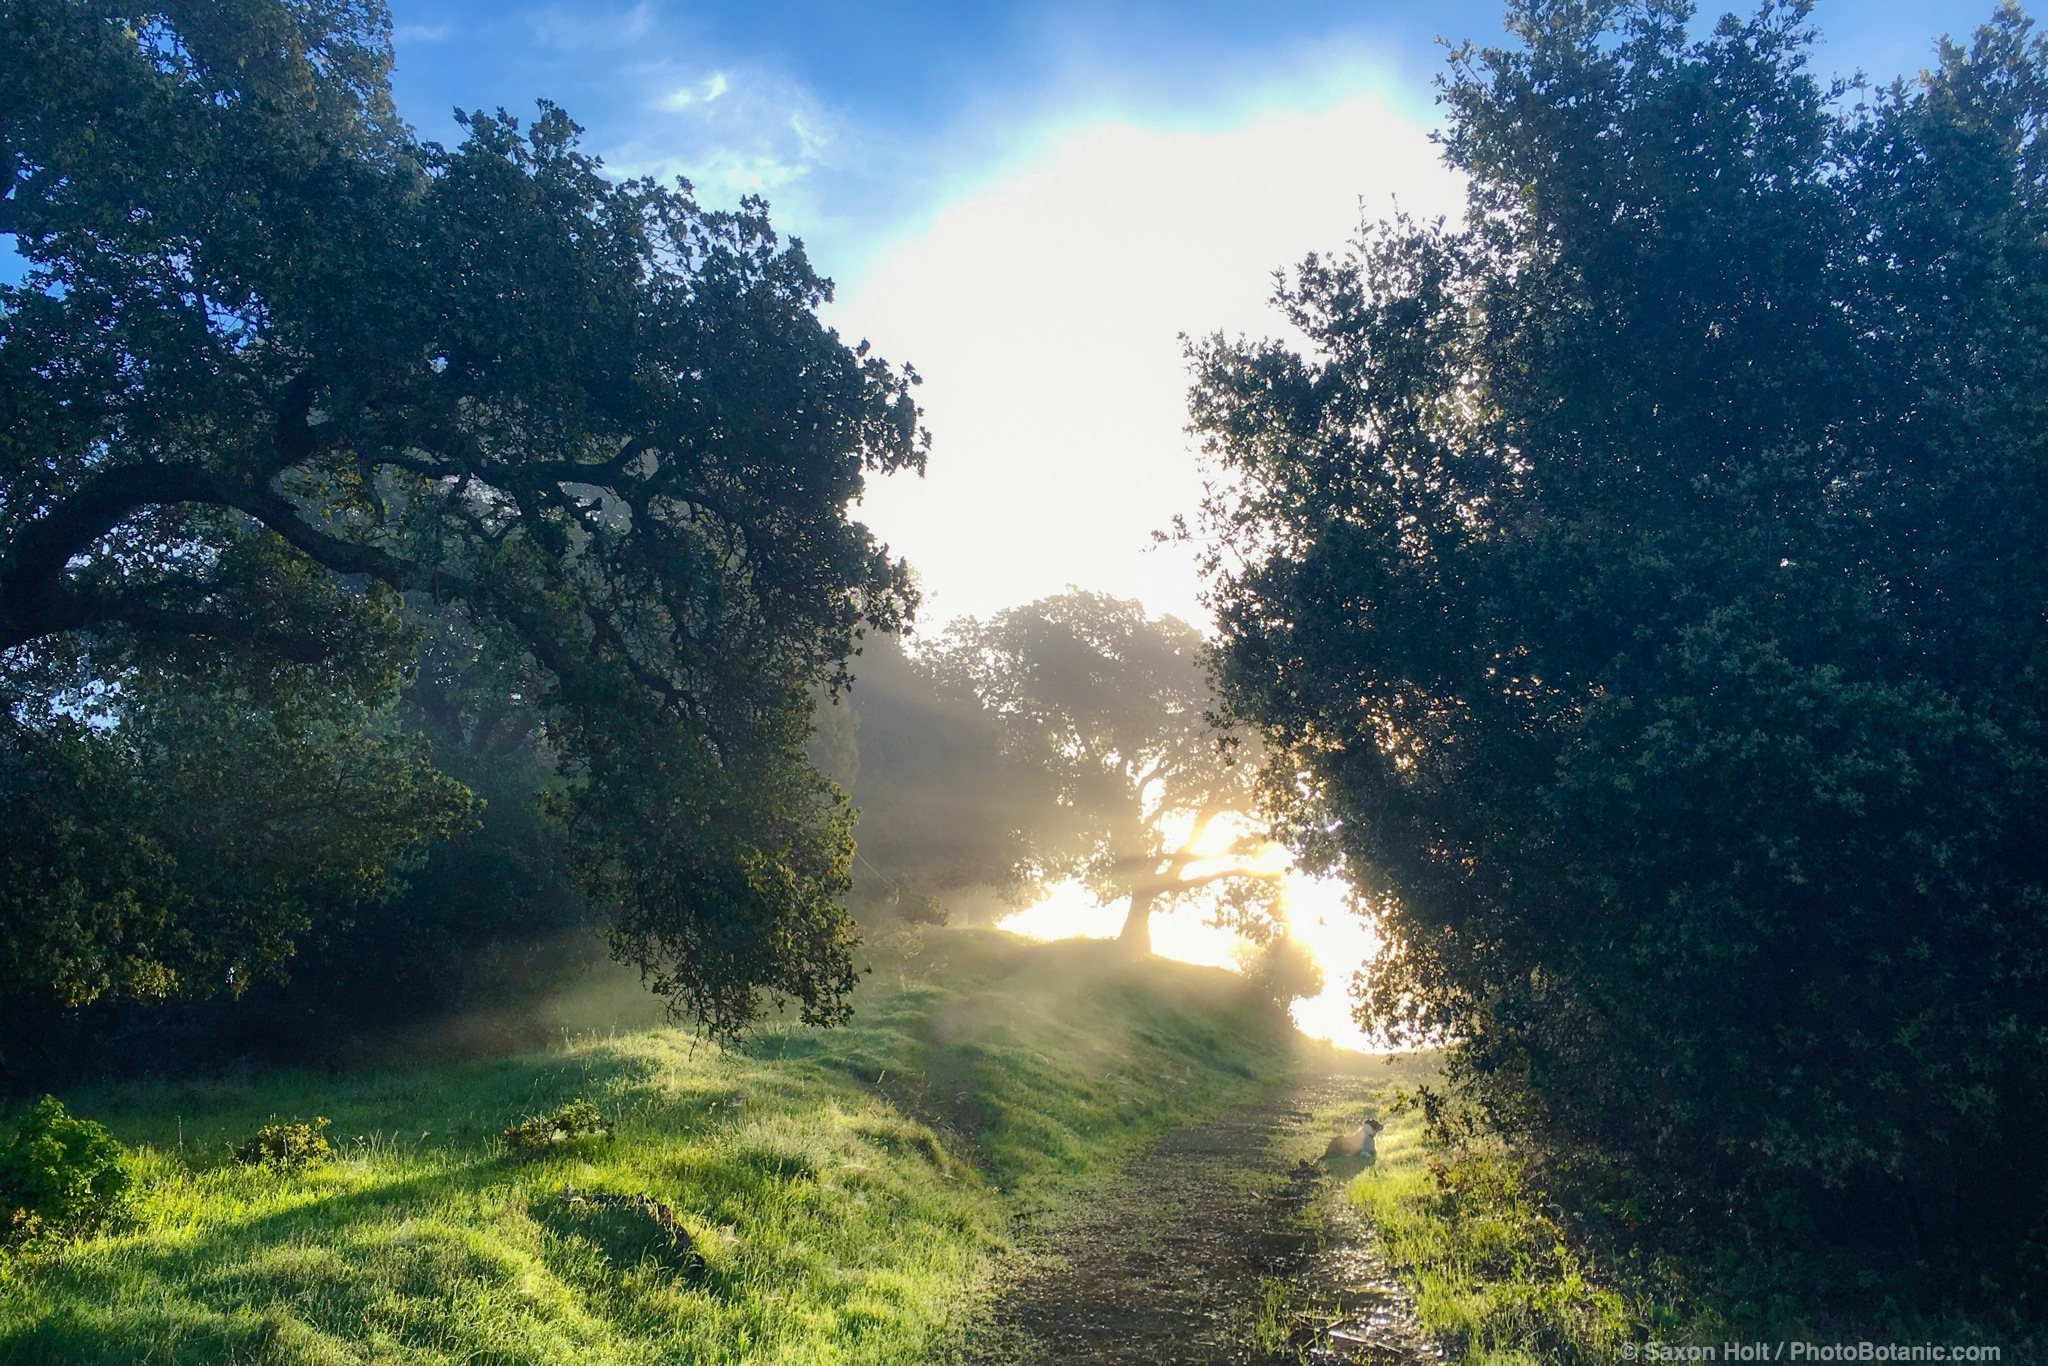 Morning light - fog breaking in the winter green hills California. Cherry Hill. 02/29/2016 08:02:58